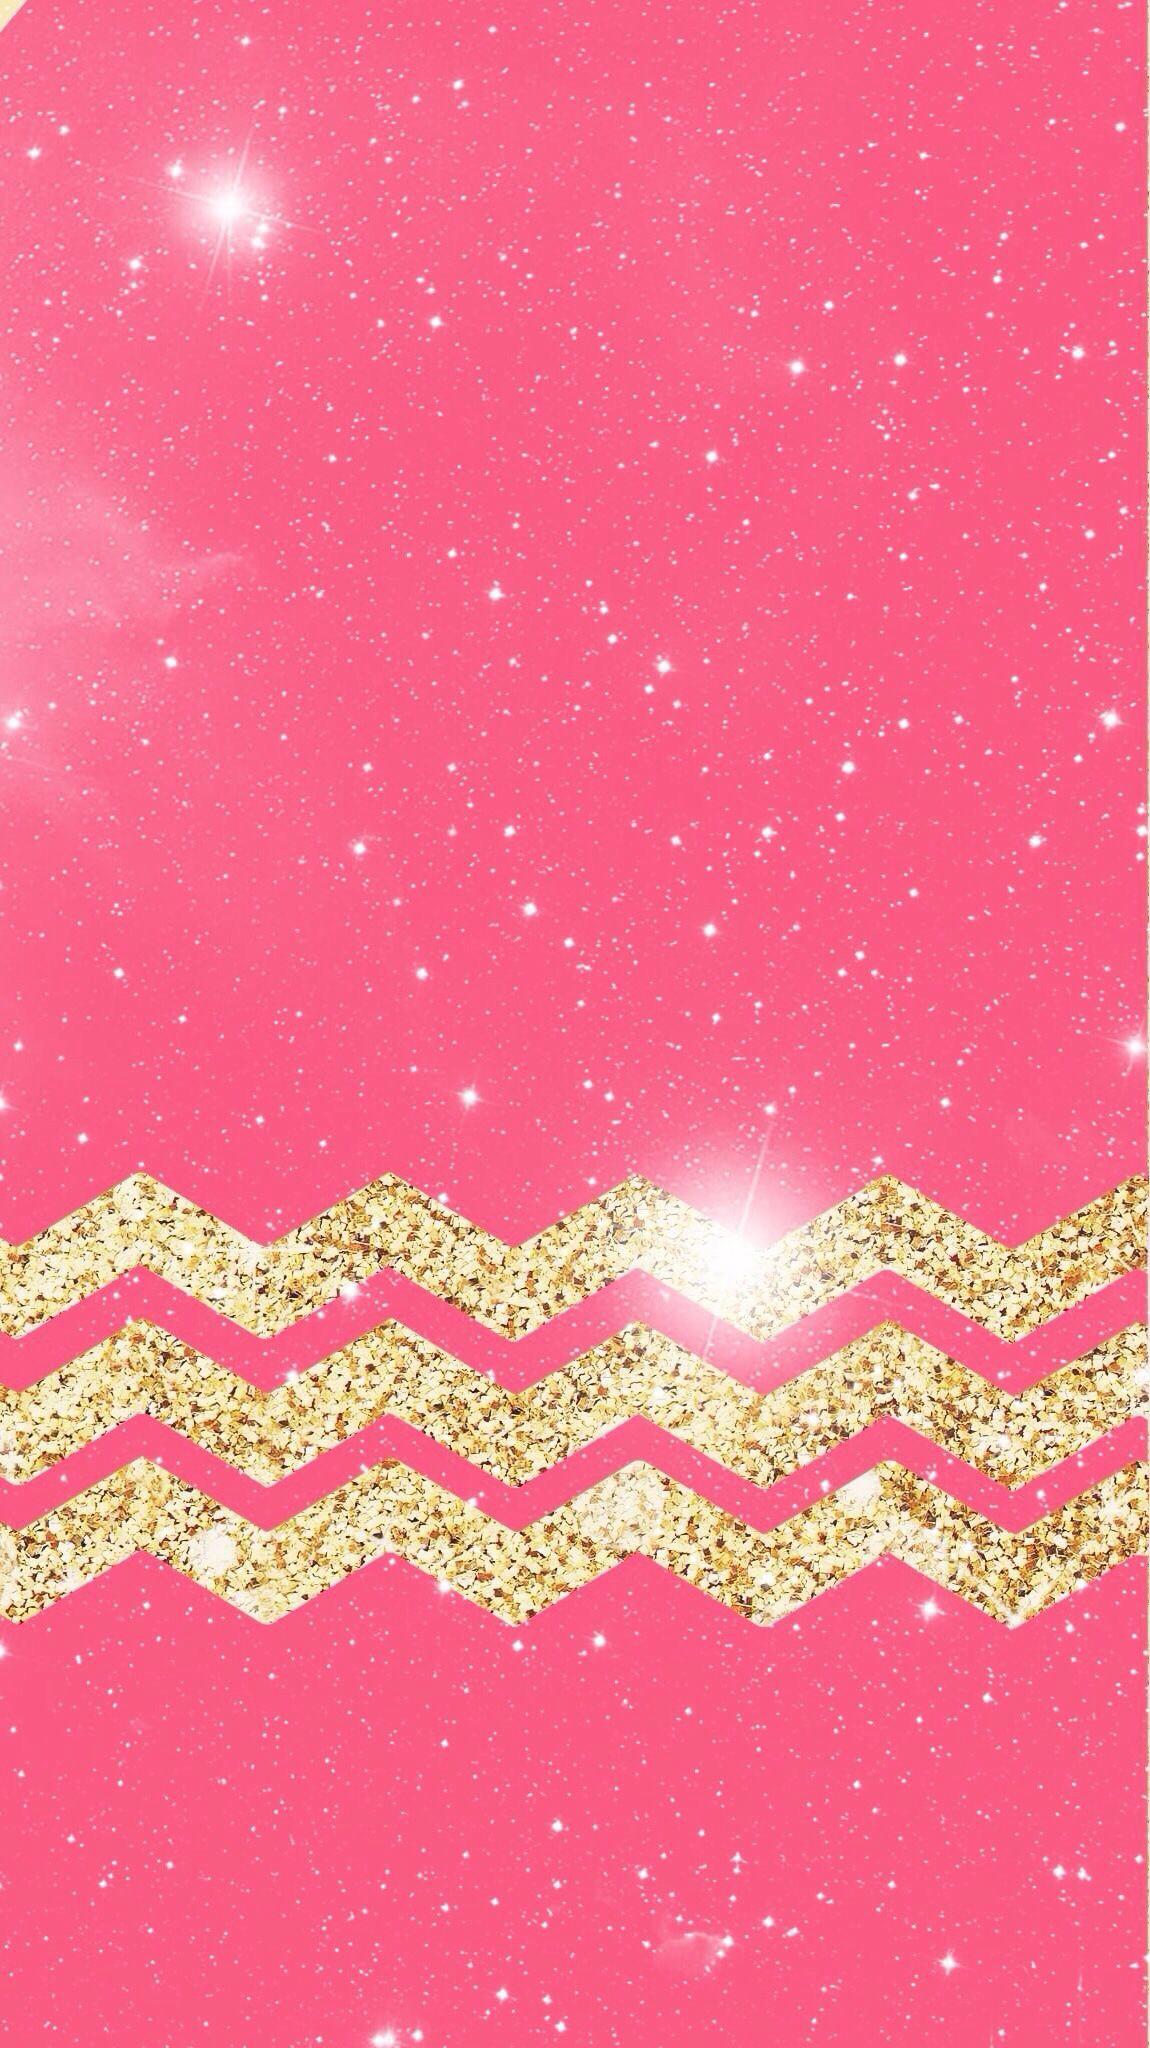 Pink & Glitter, my 2 favorite things